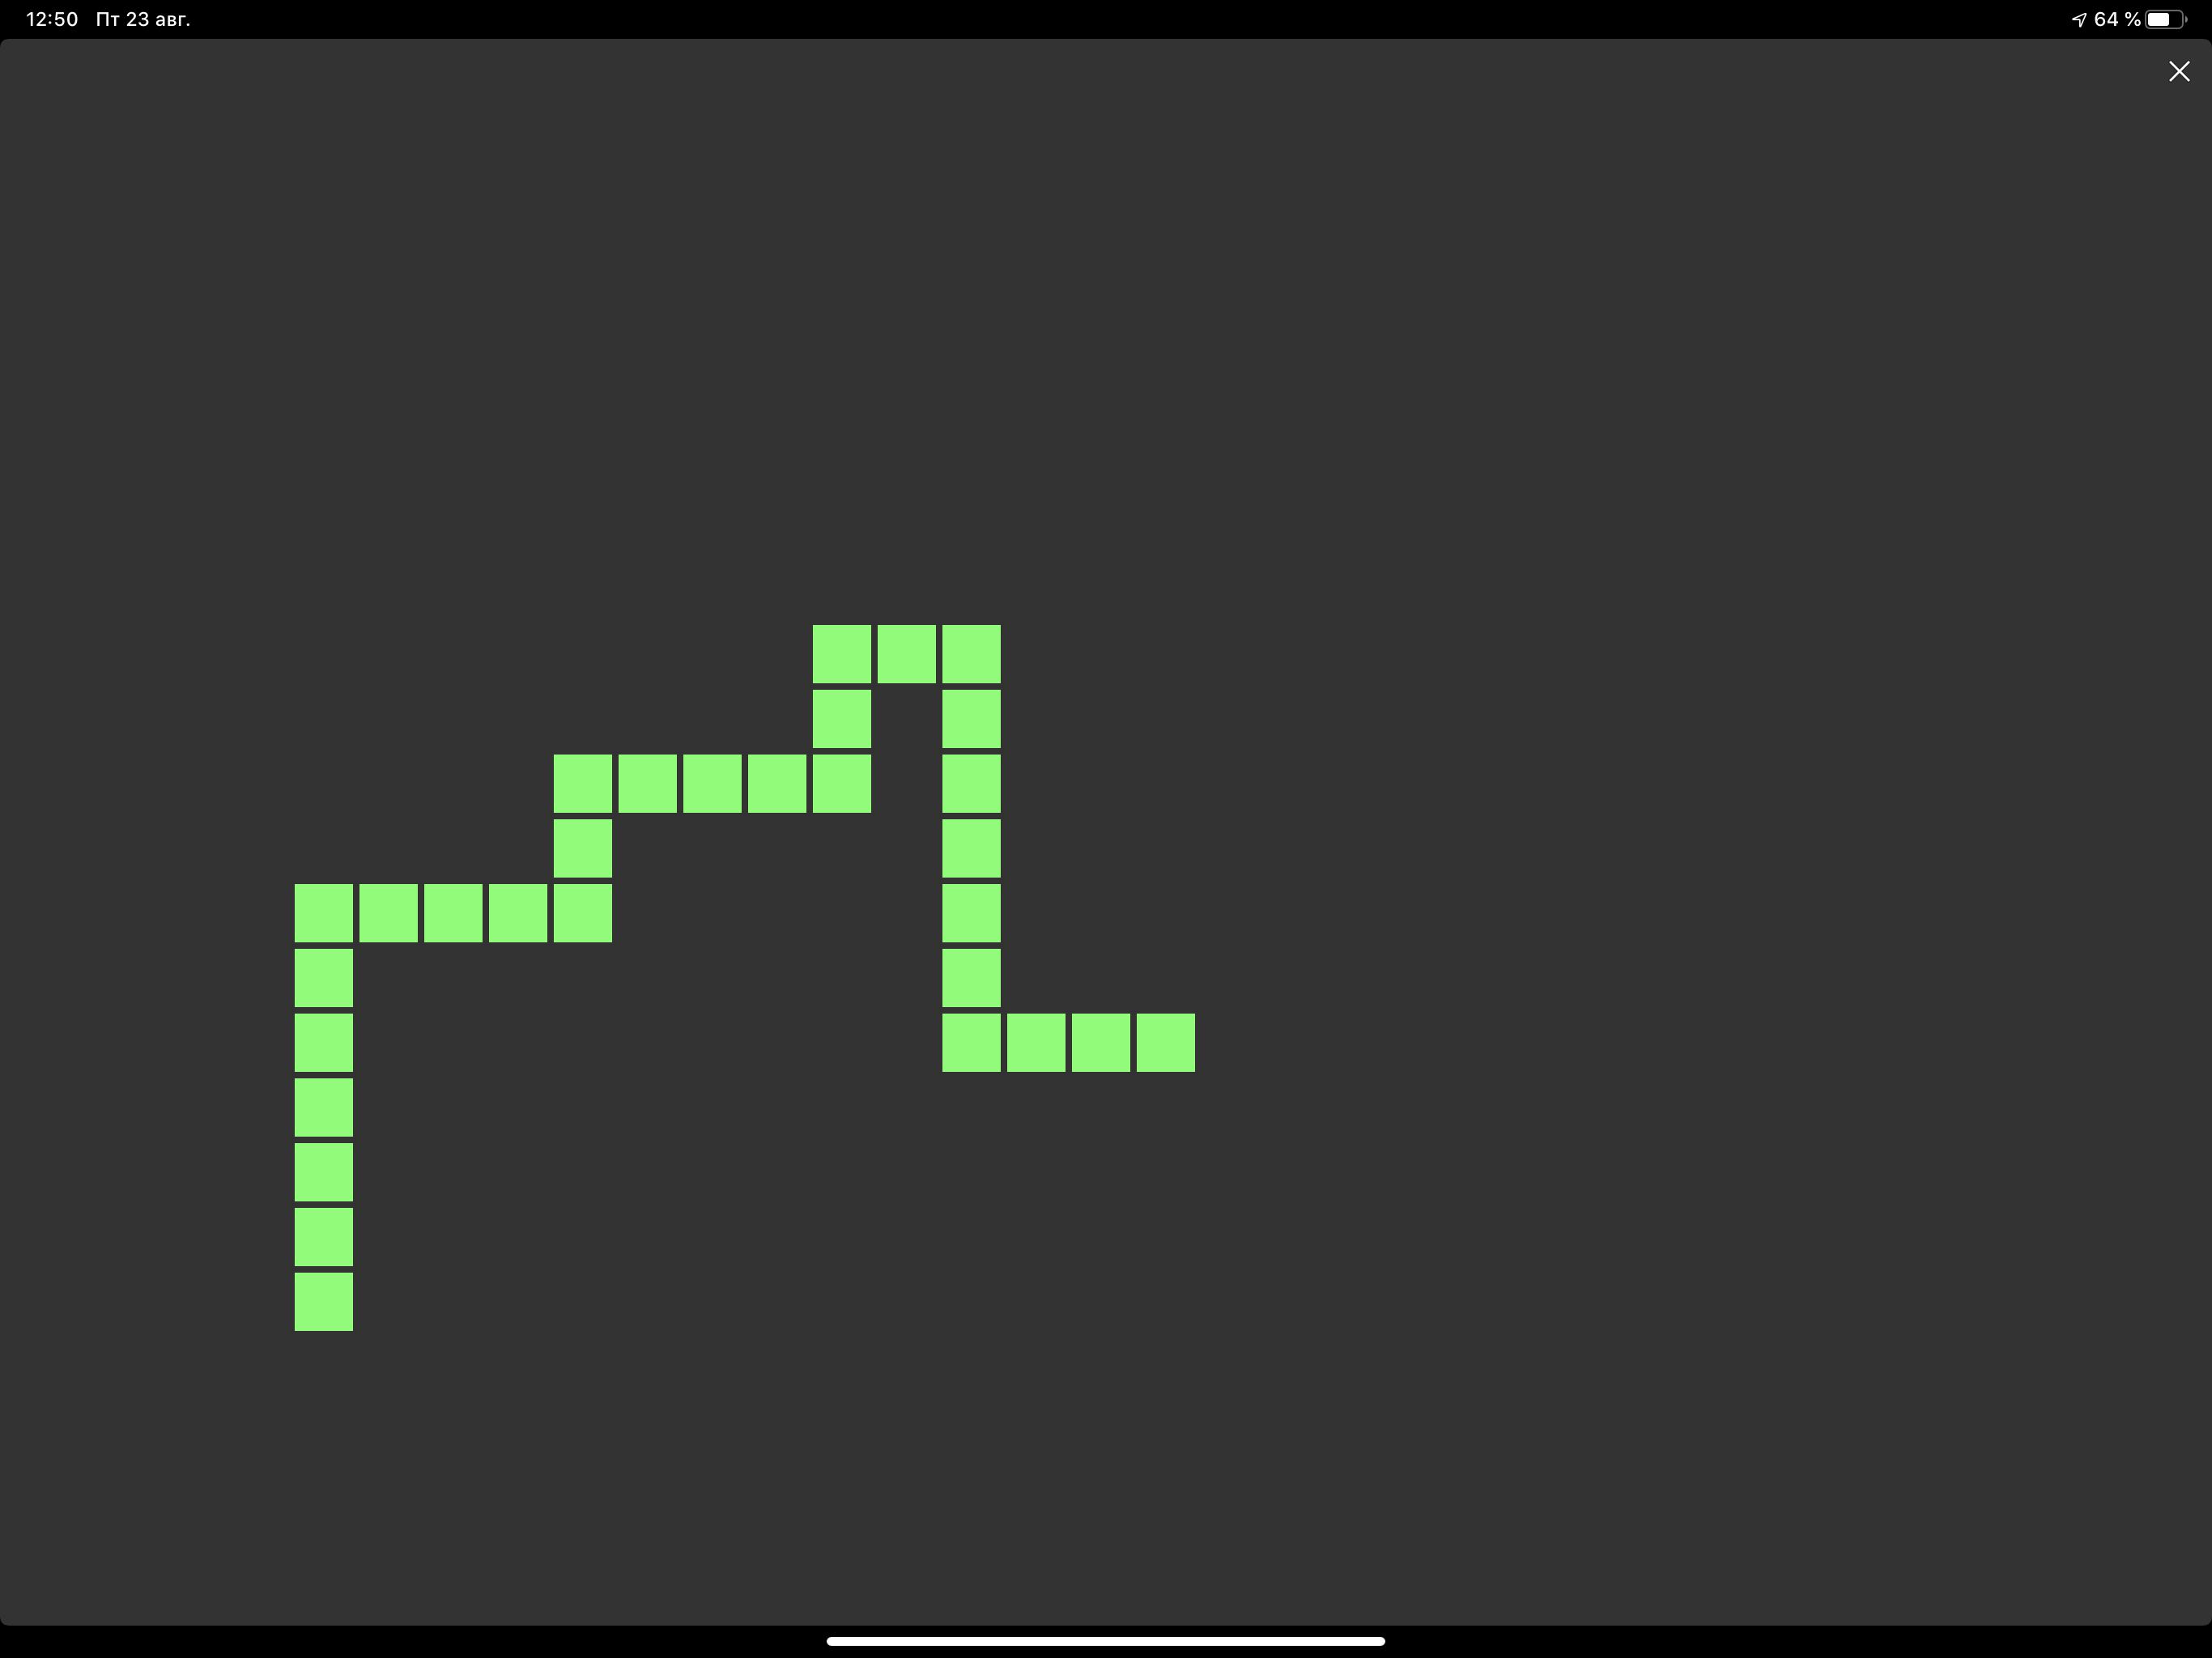 Написание змейки на ipad (pythonista) - 13